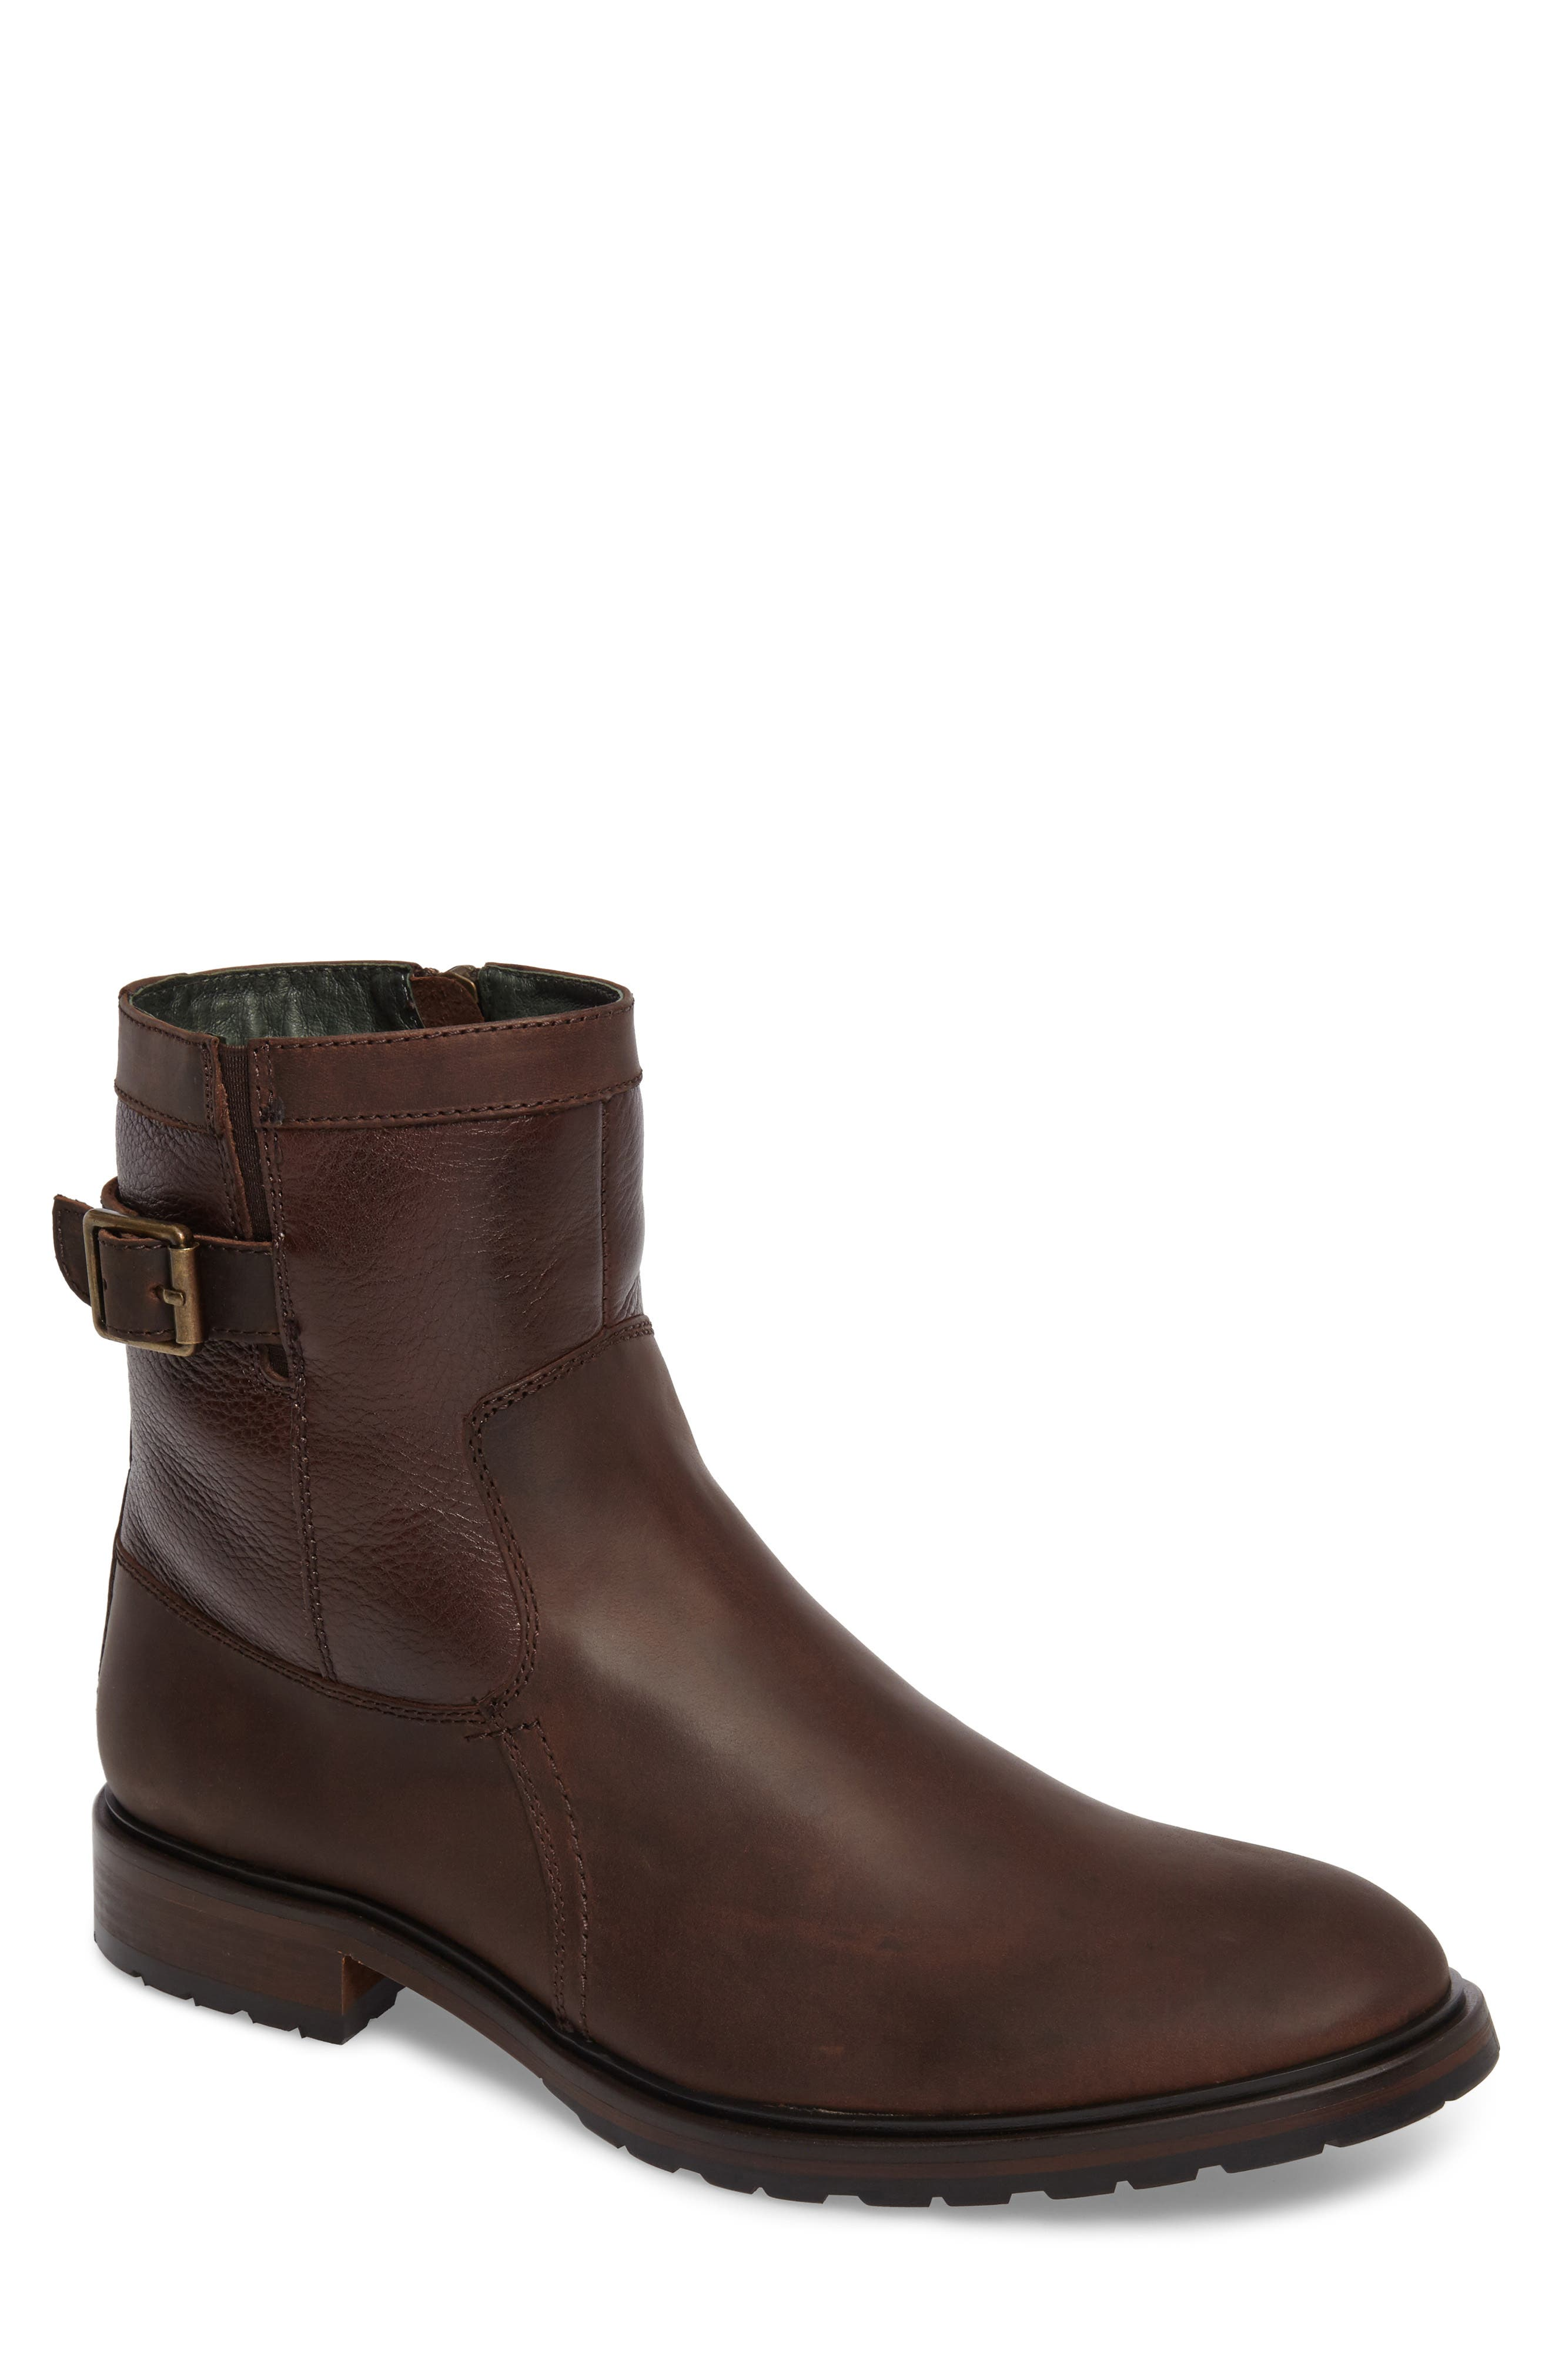 Myles Zip Boot,                             Main thumbnail 1, color,                             Dark Brown Leather